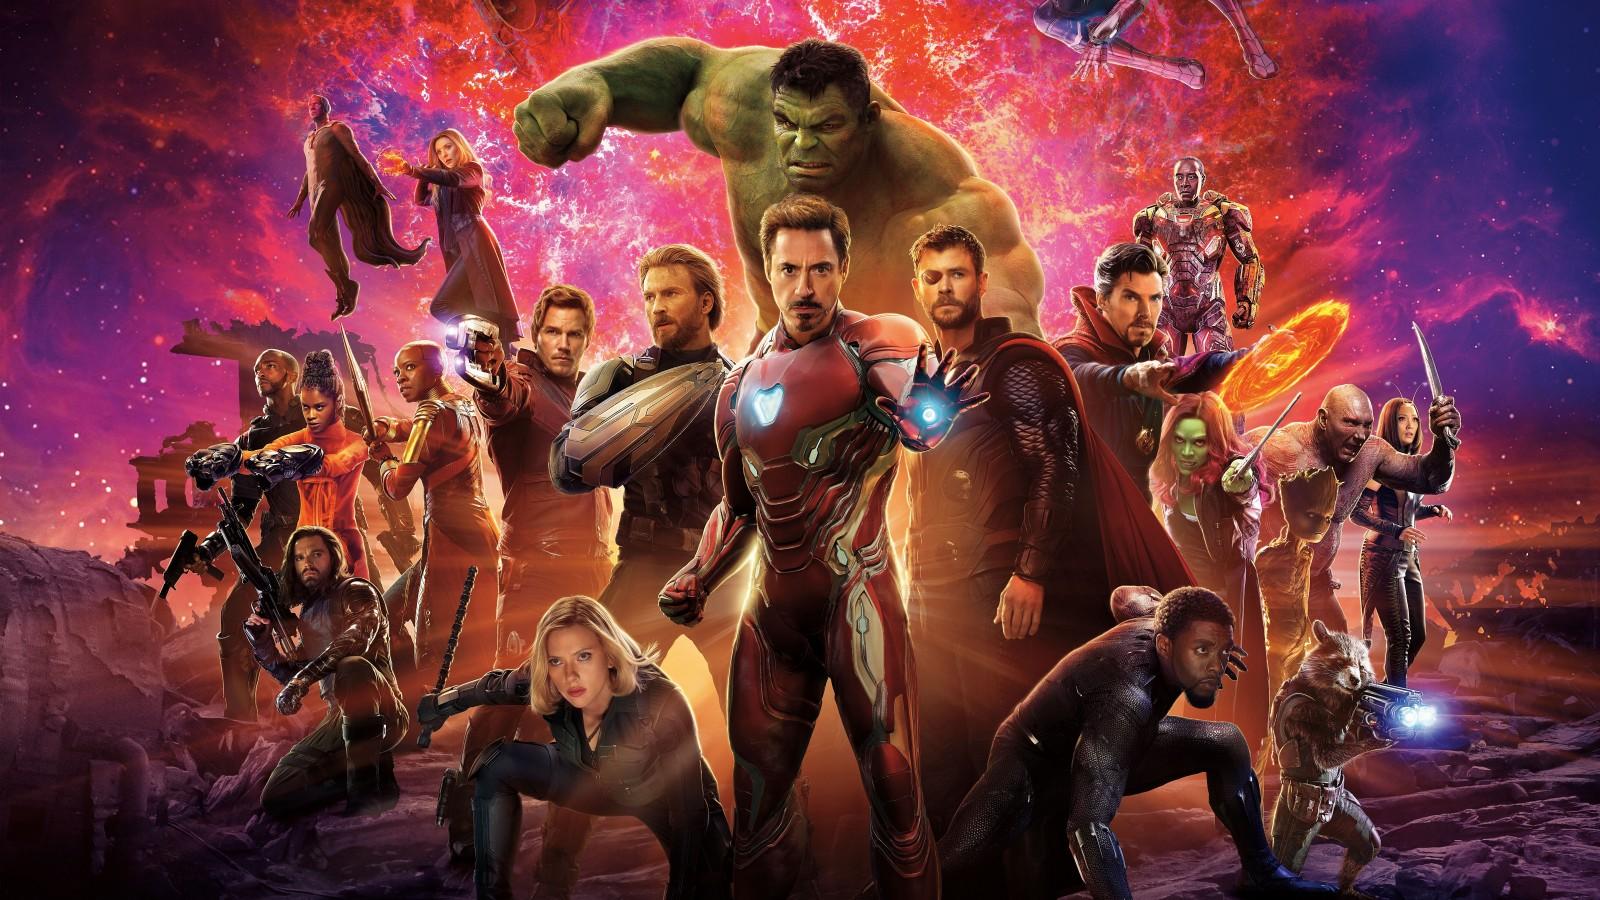 Hd Ipad Retina Wallpapers Avengers Infinity War 2018 4k 8k Wallpapers Hd